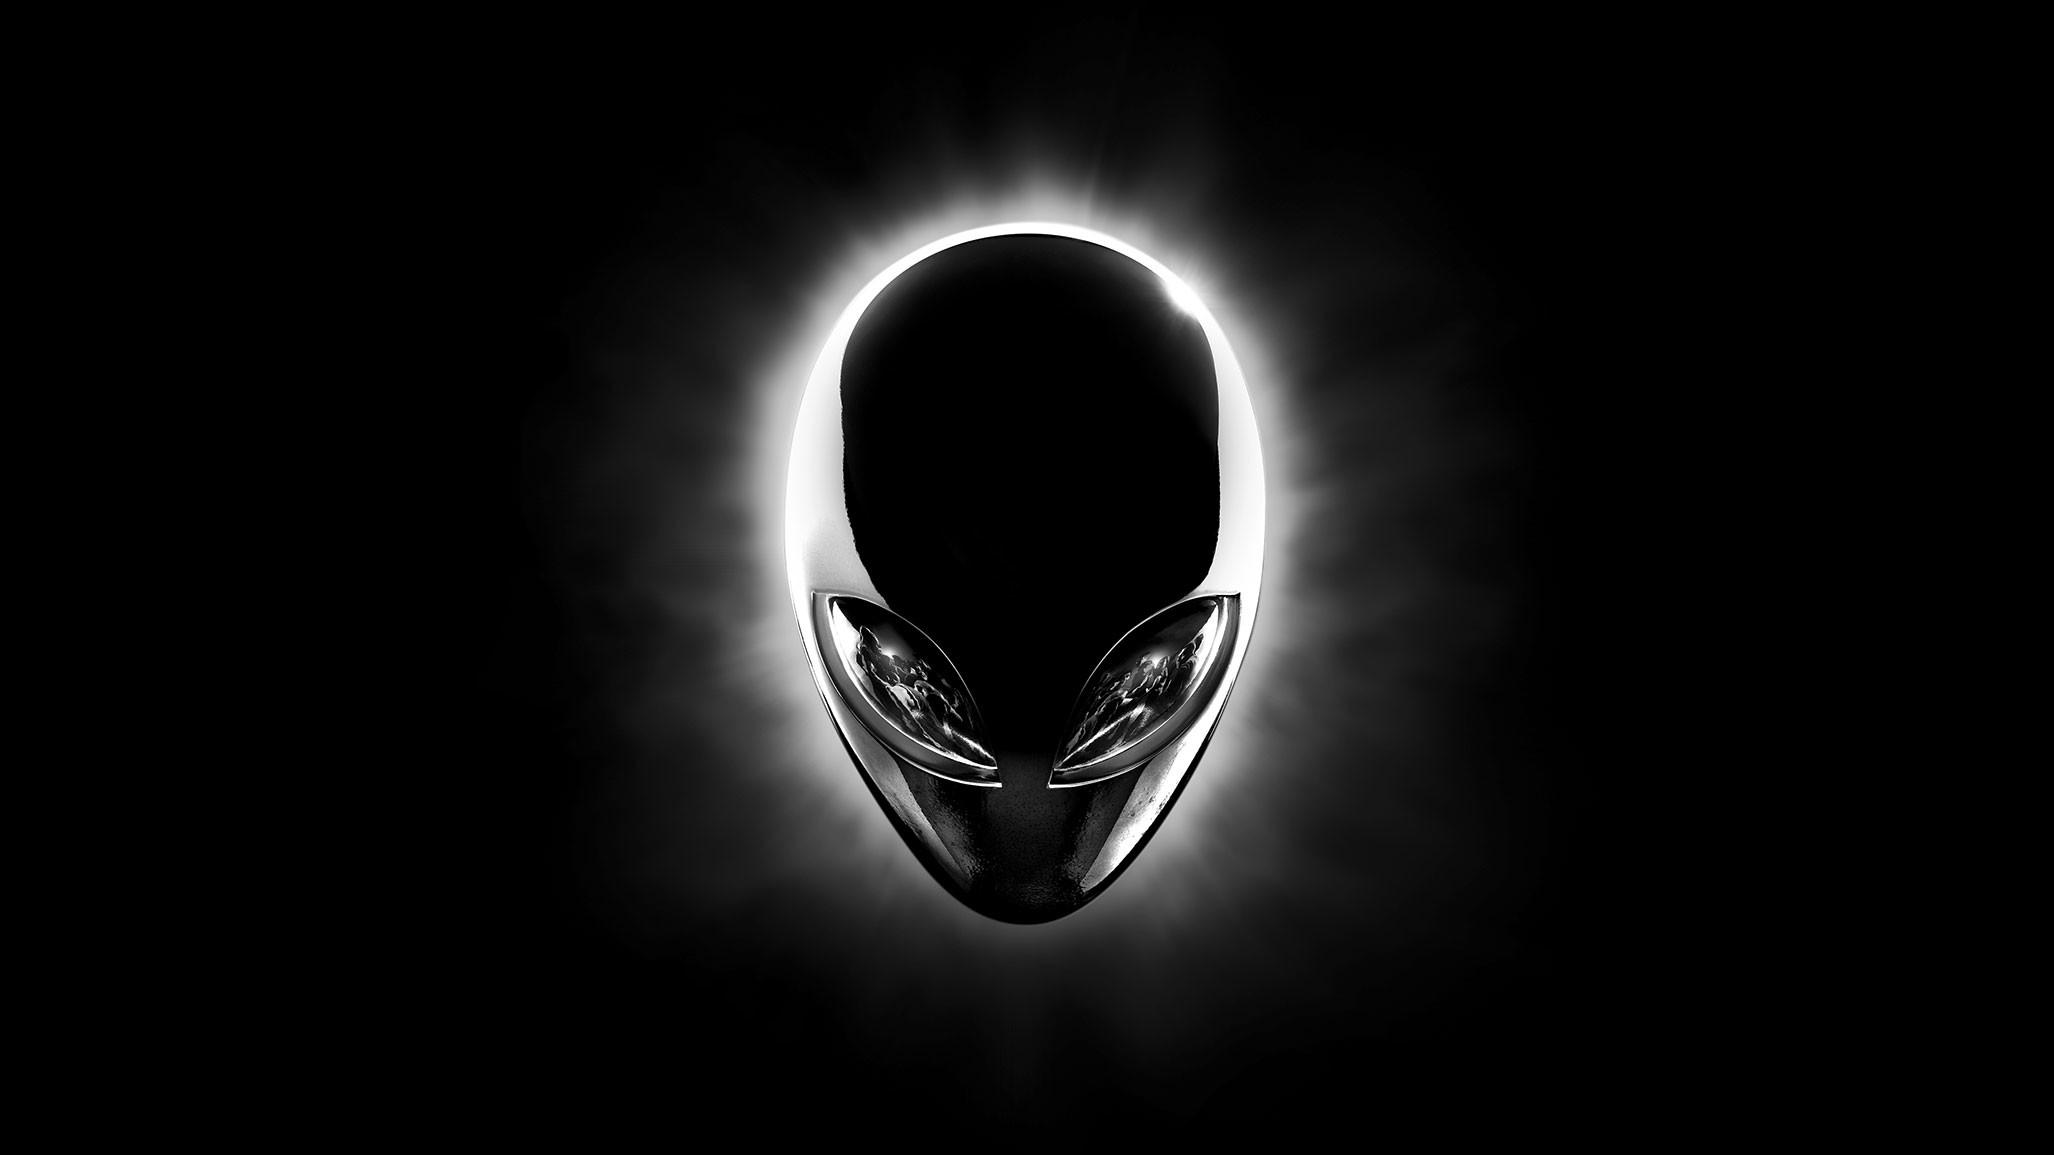 Alienware Black Phone Wallpaper : Brands Wallpaper – Timbena.com